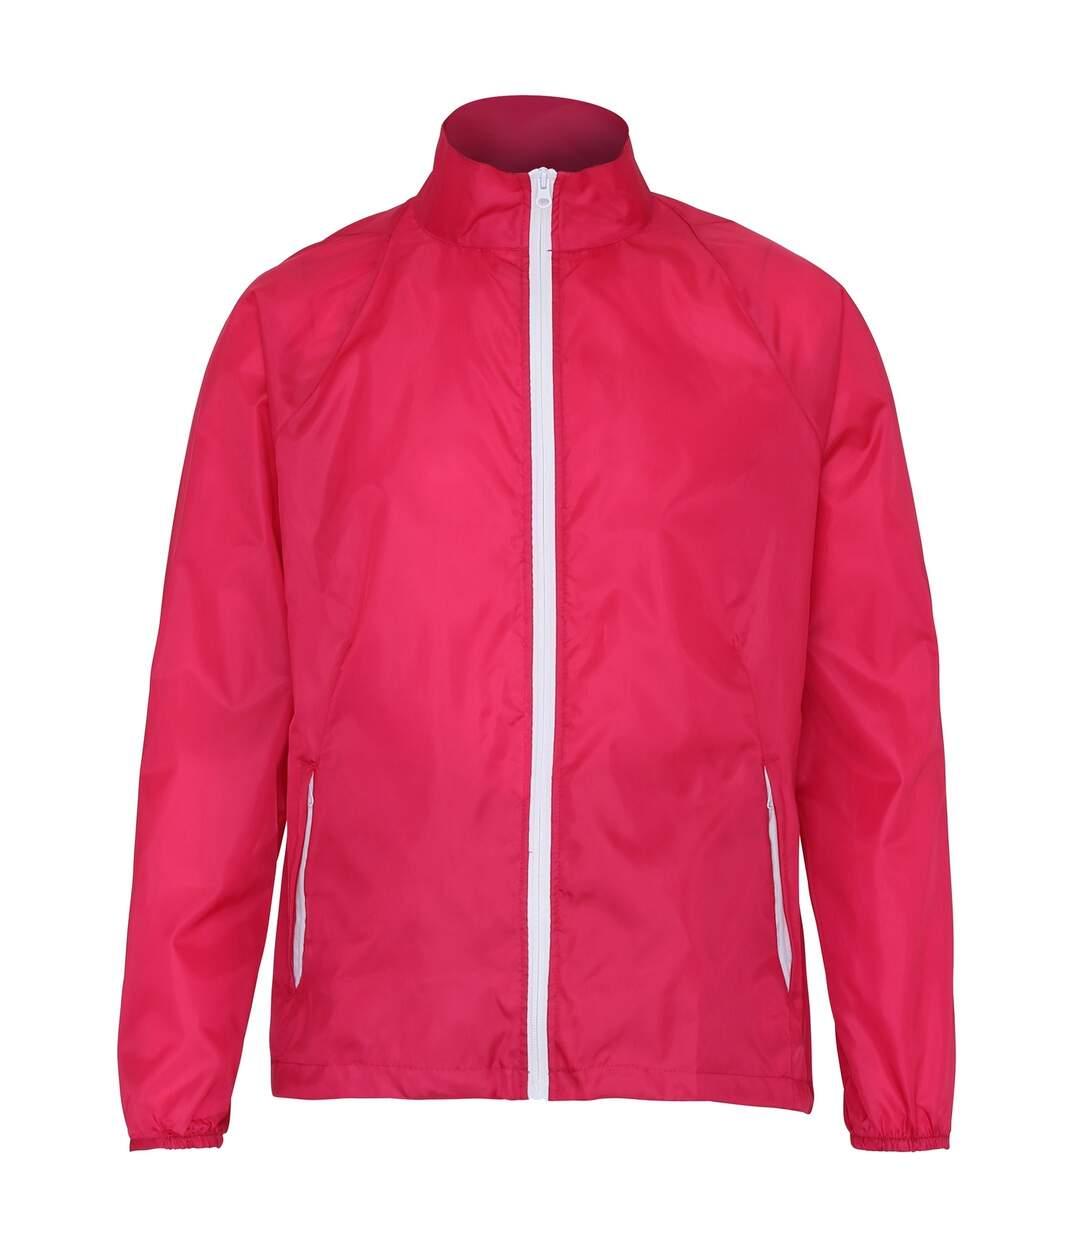 2786 Mens Contrast Lightweight Windcheater Shower Proof Jacket (Purple/ White) - UTRW2501